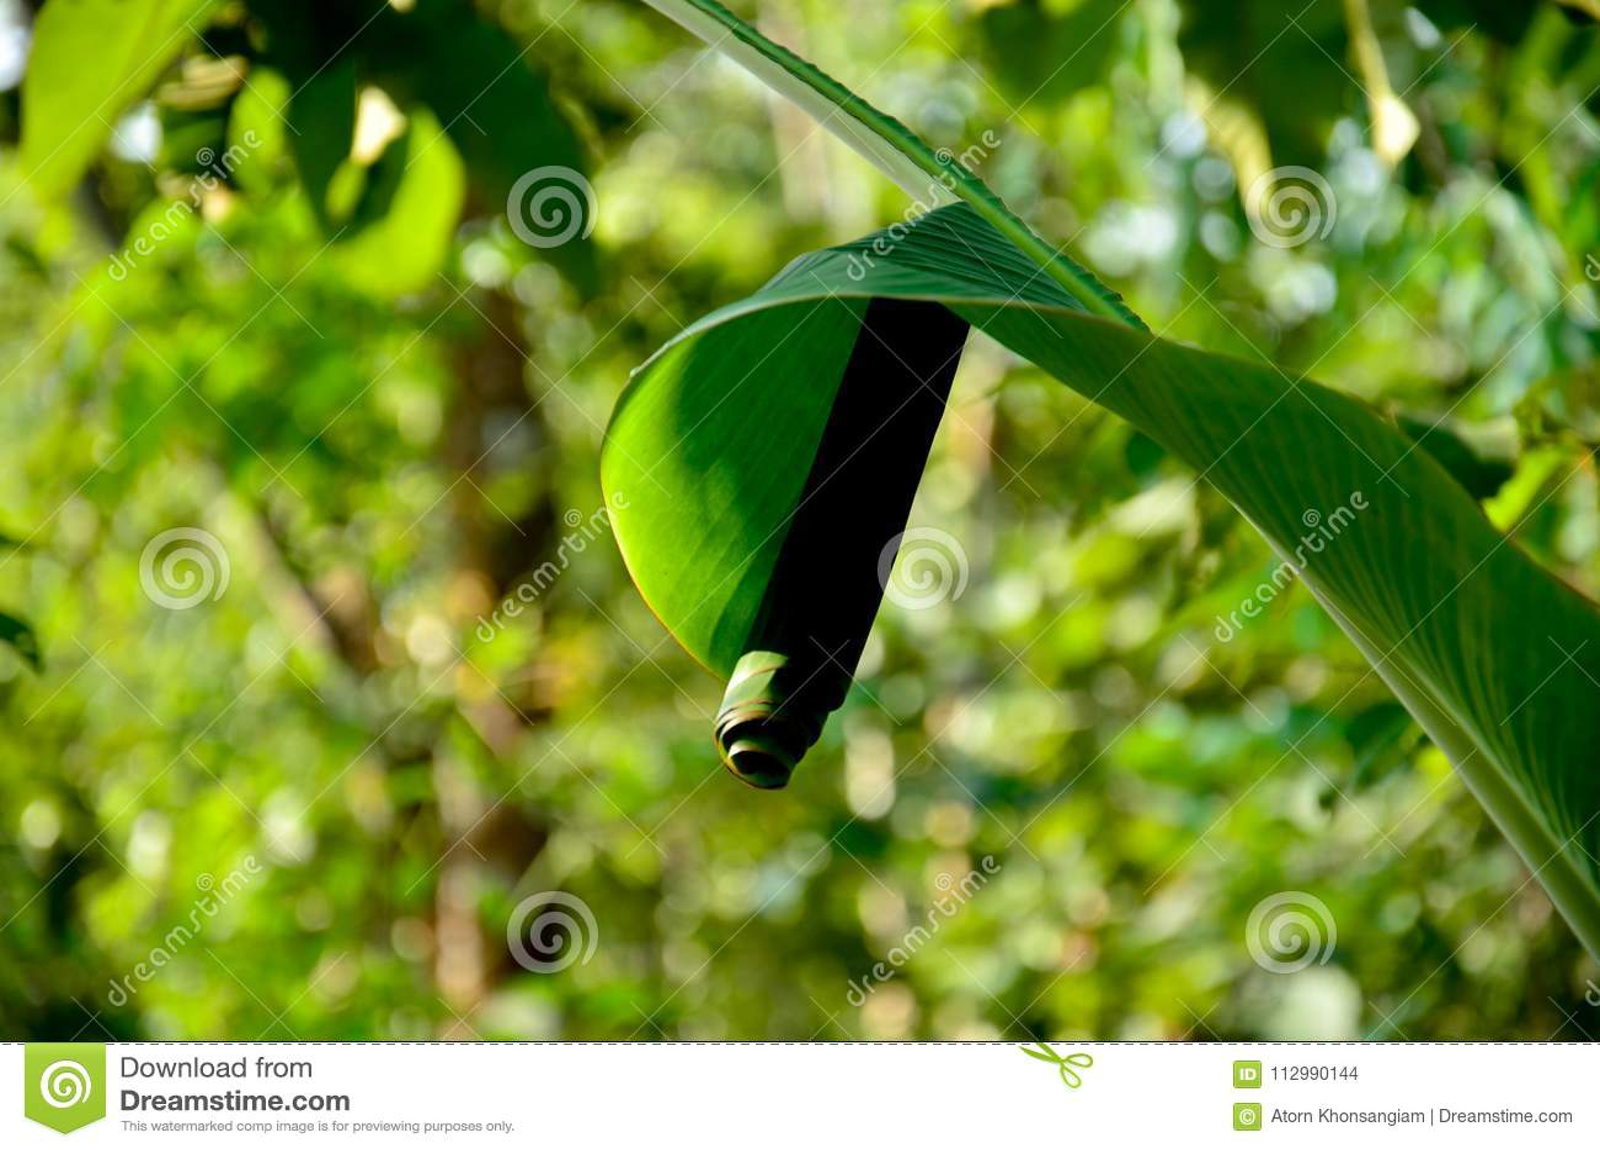 Banana leaf is often used as a habitat for leaf rolls.